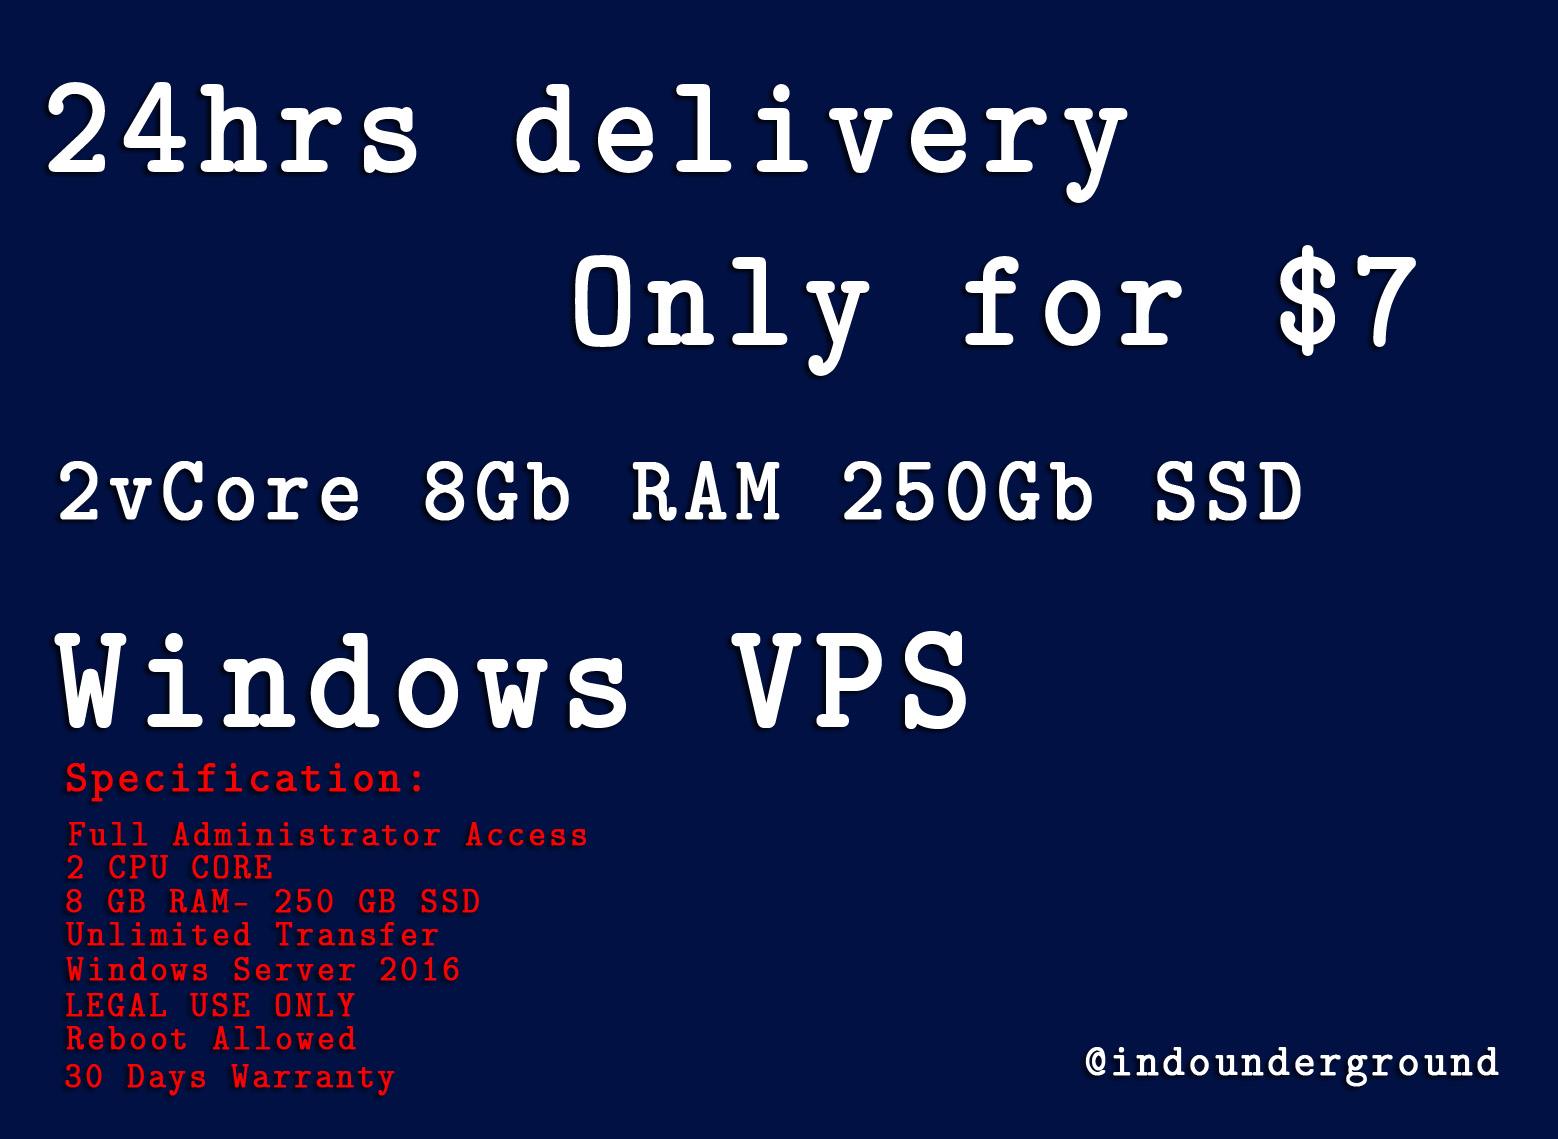 Windows VPS 2vCore 8Gb RAM 250Gb SSD